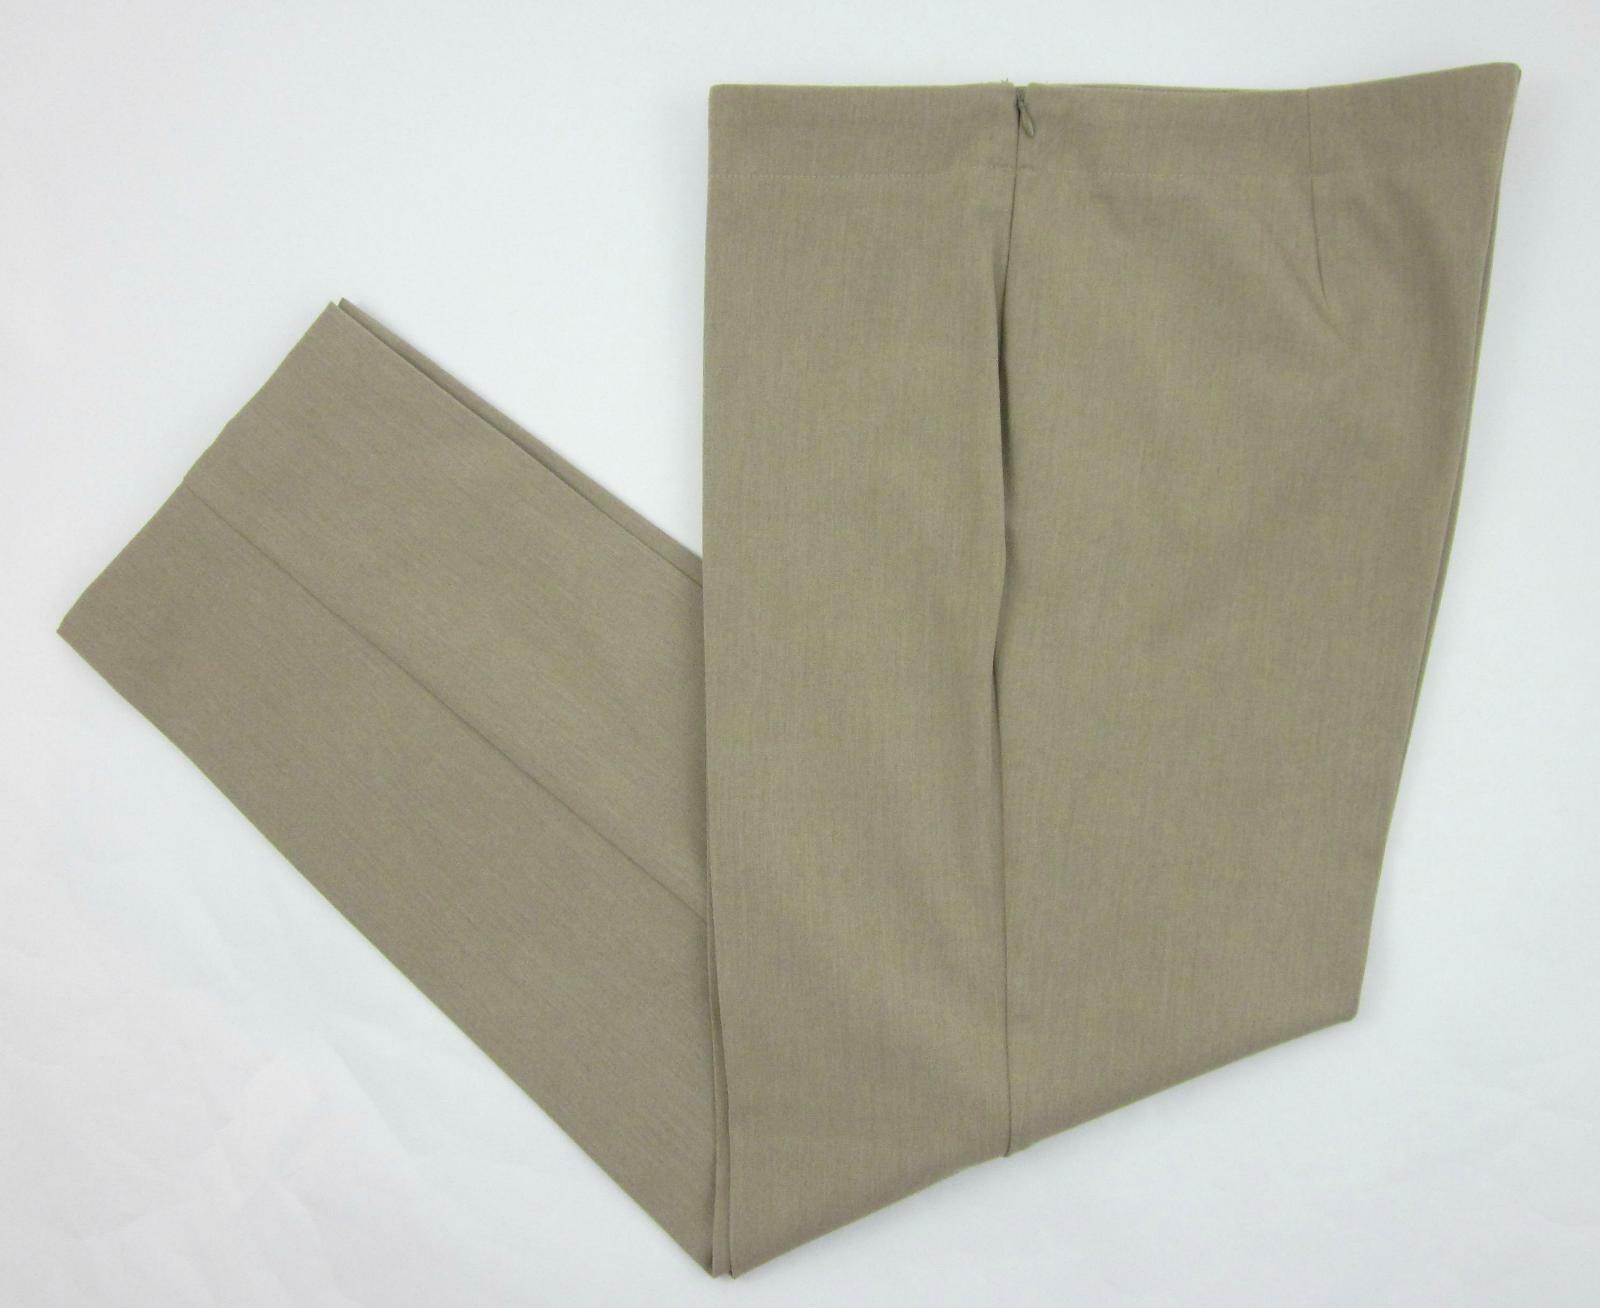 Talbots Size 16 Classic Side Zip Pants Camel Khaki Twill MINT